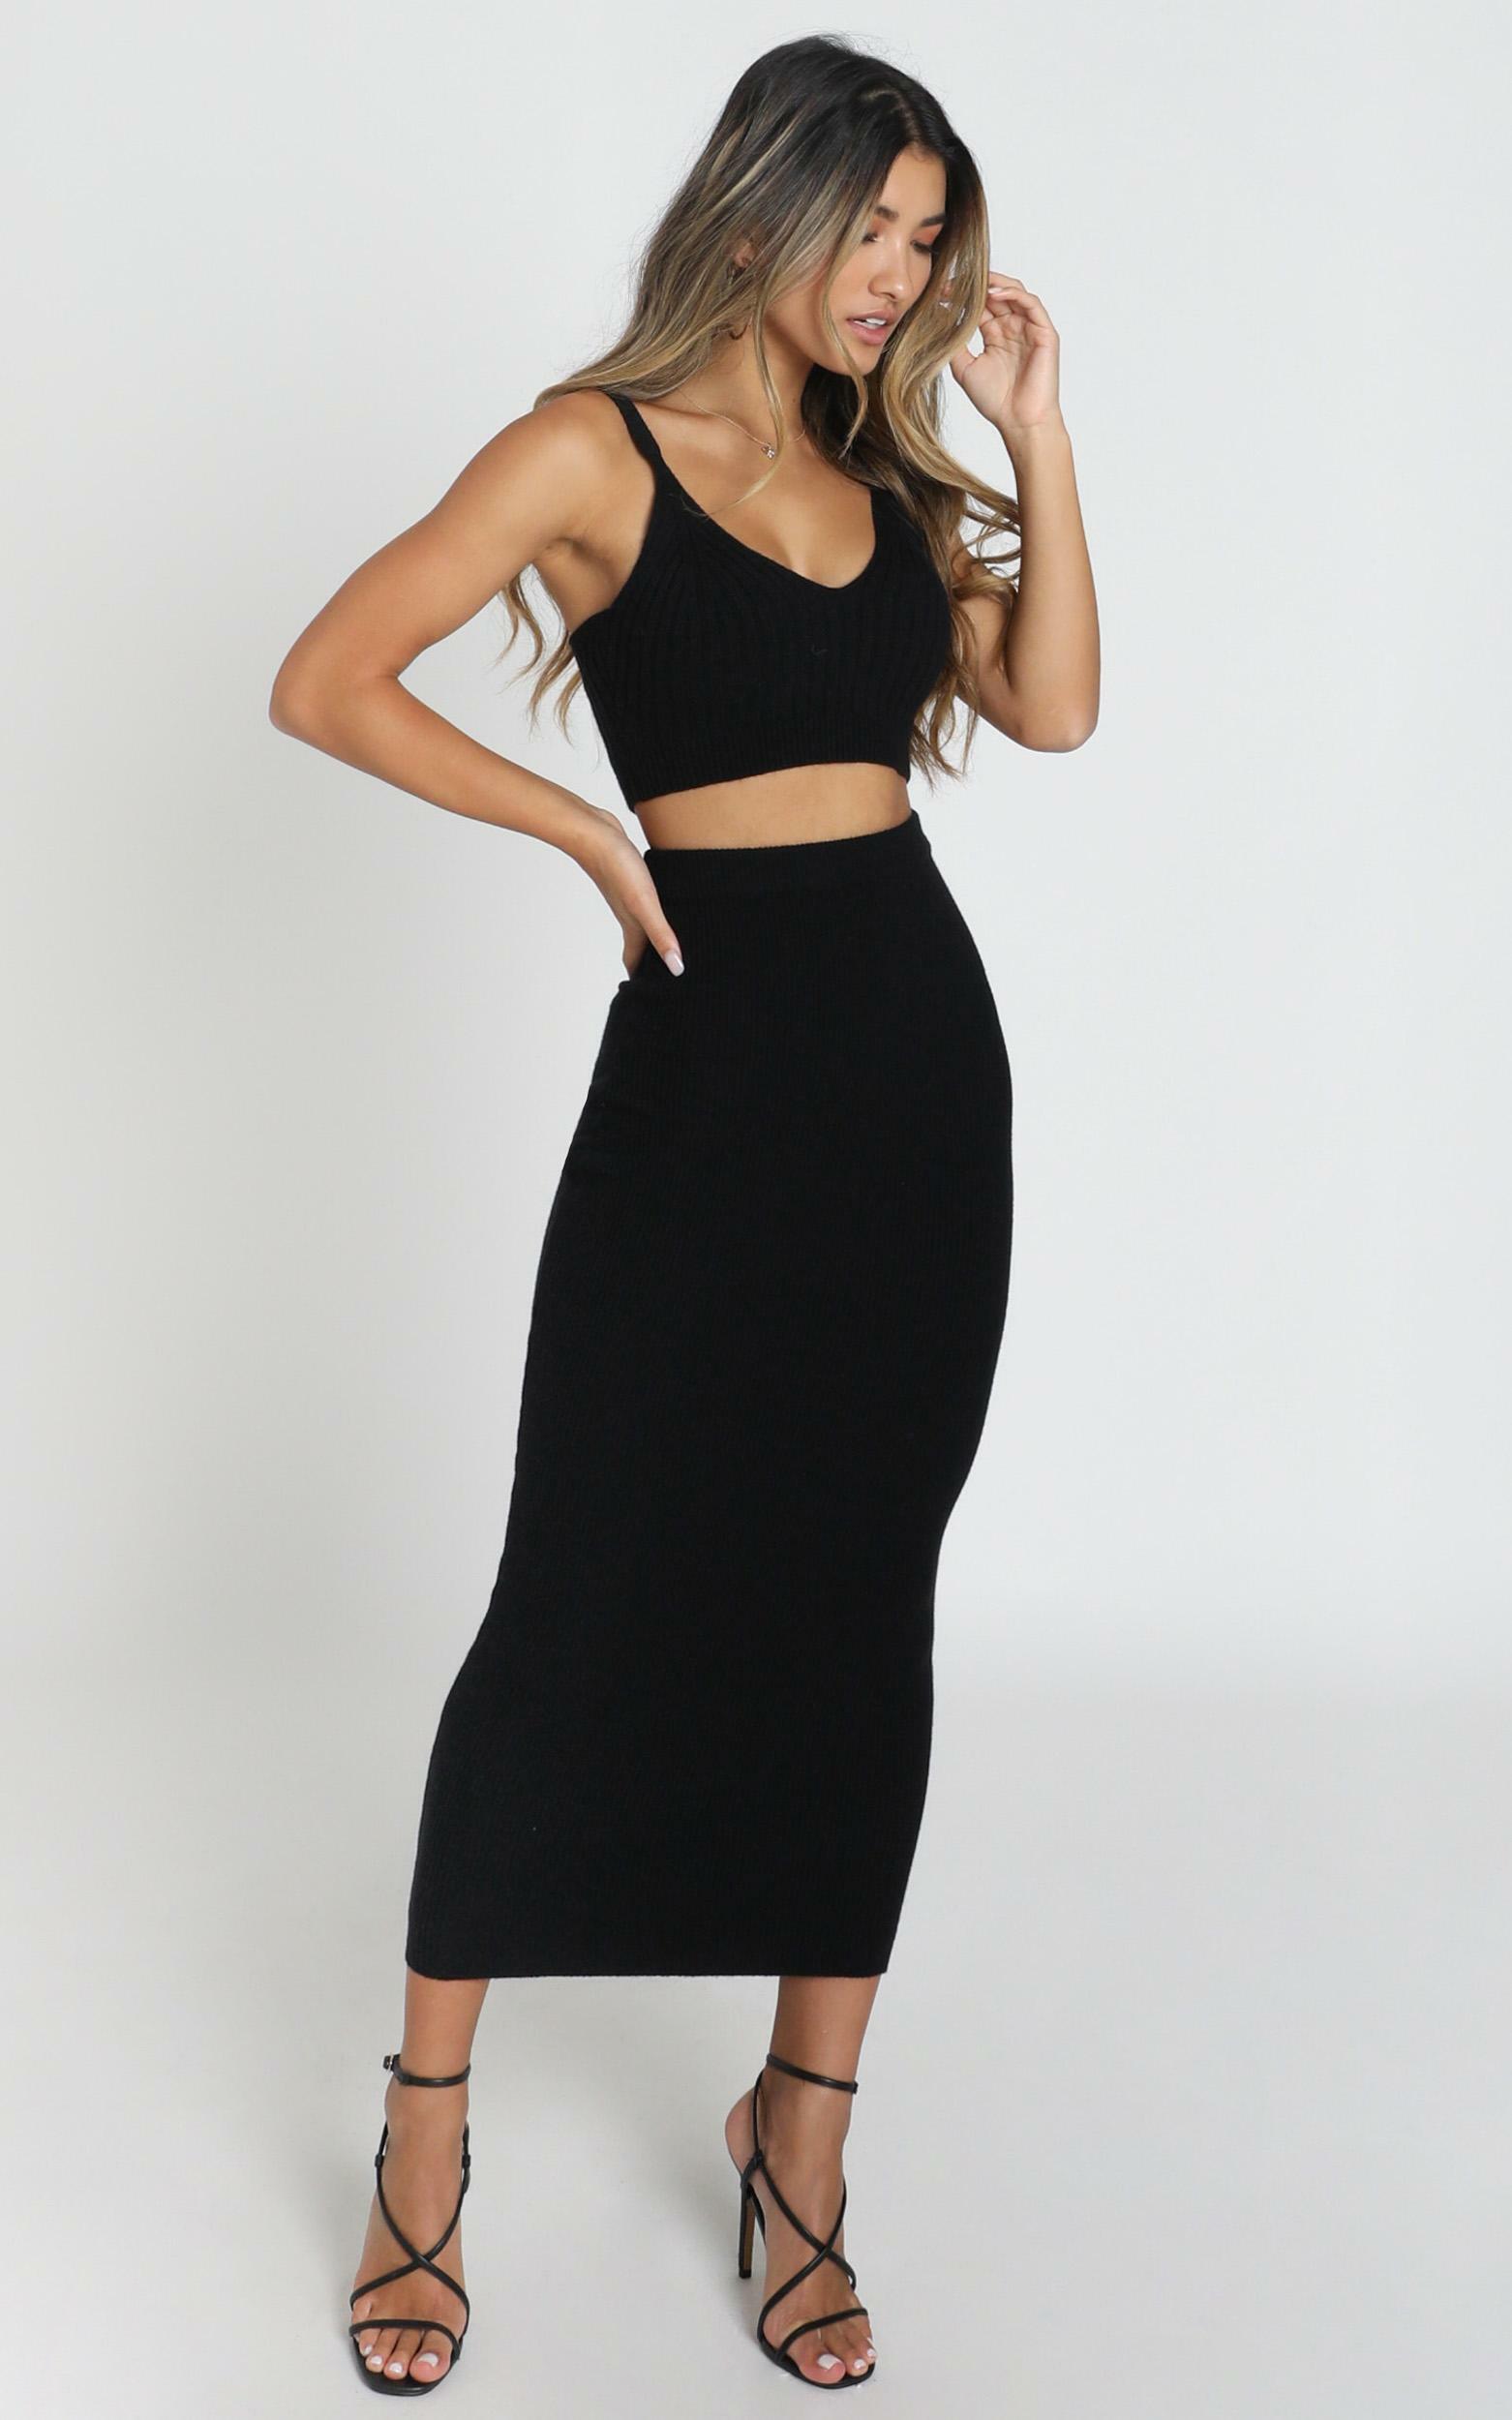 Jessie Knit Skirt in Black Rib - 06, BLK1, hi-res image number null